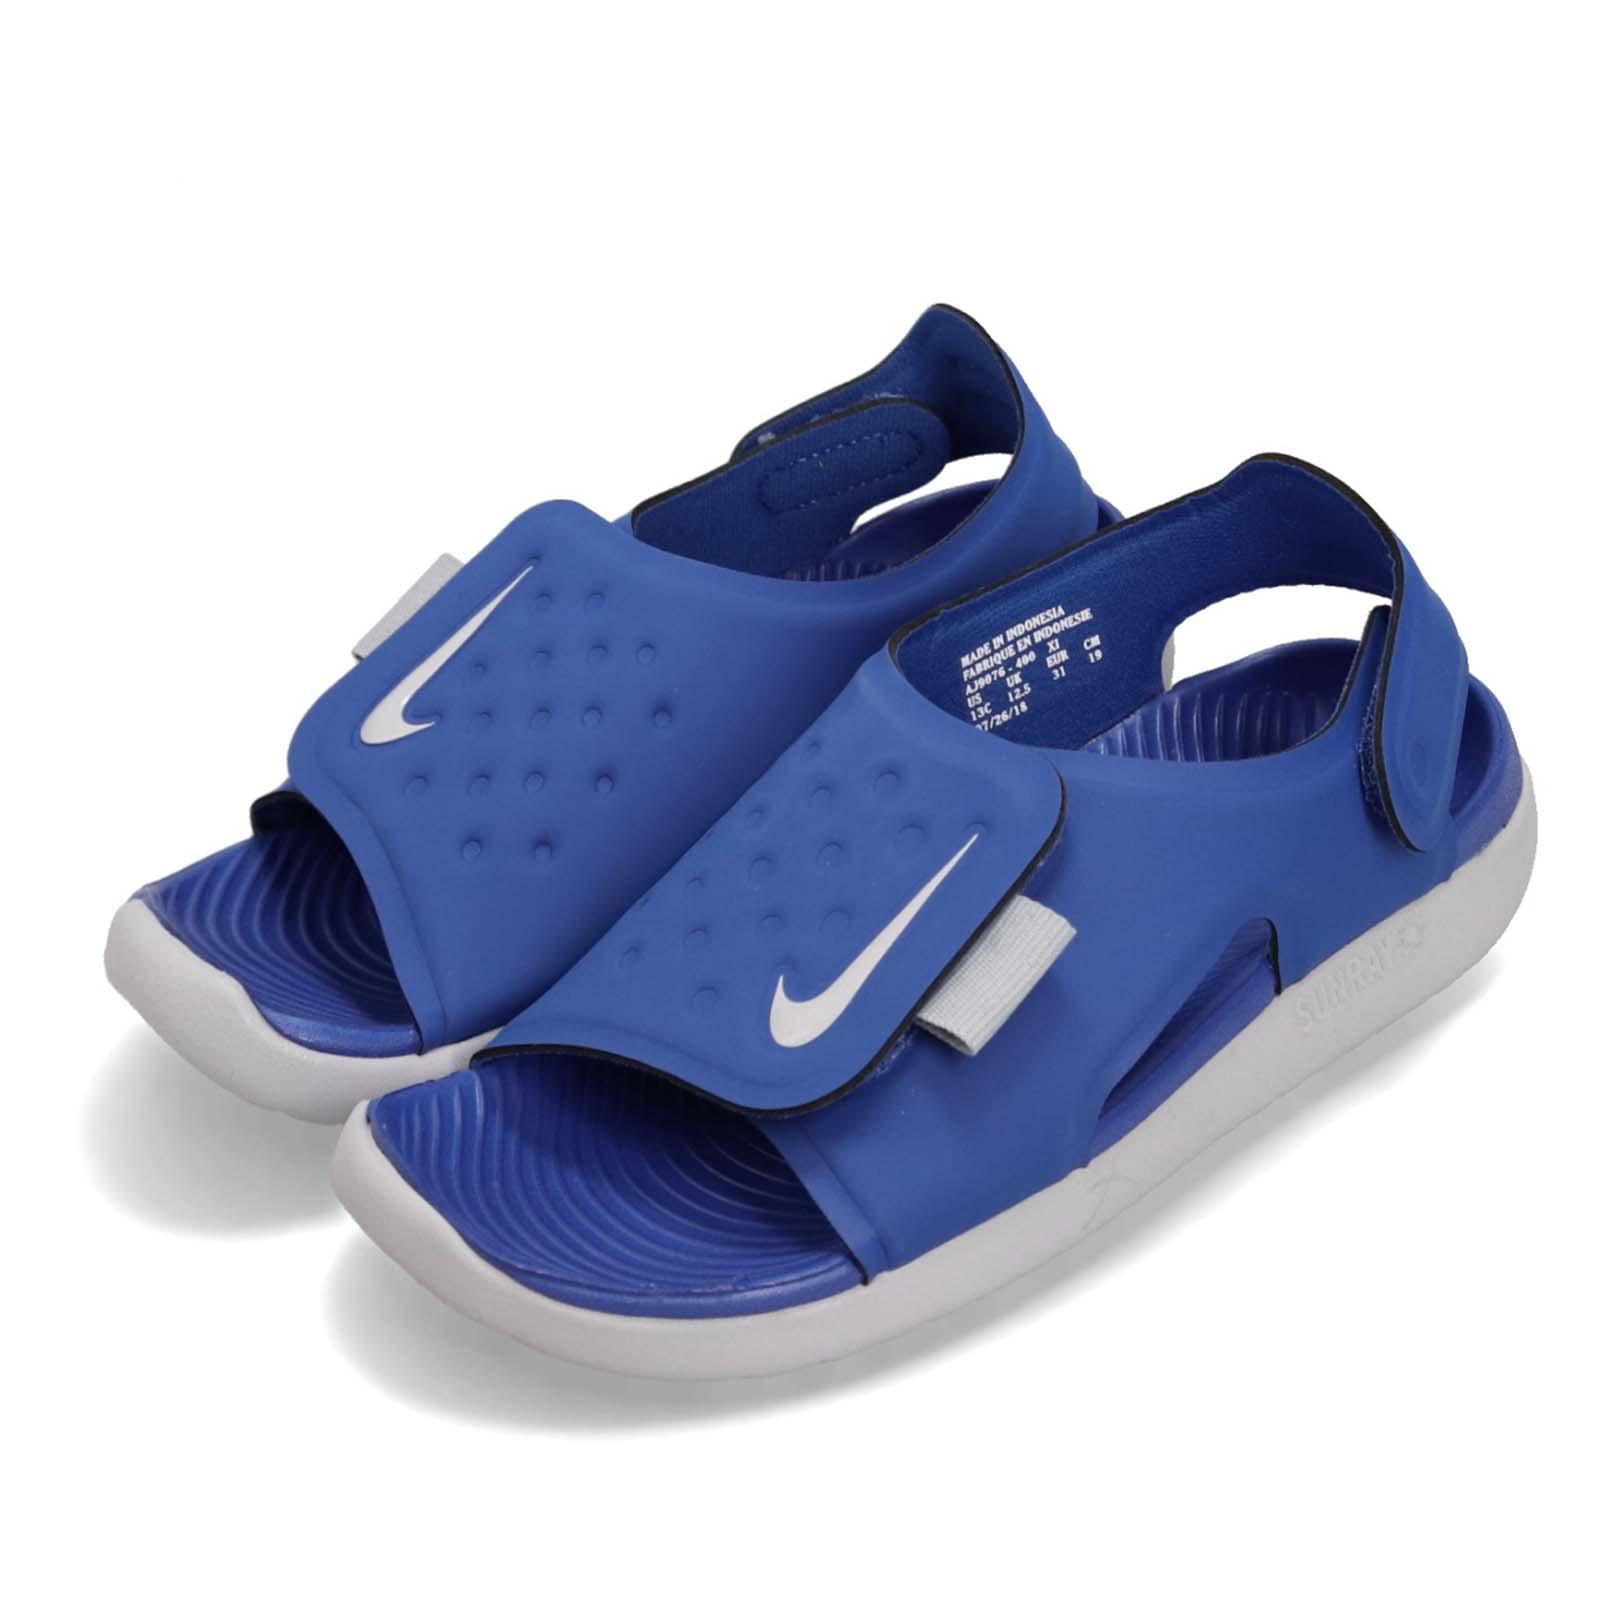 Nike 涼拖鞋 Sunray Adjust 5 童鞋 AJ9076-400